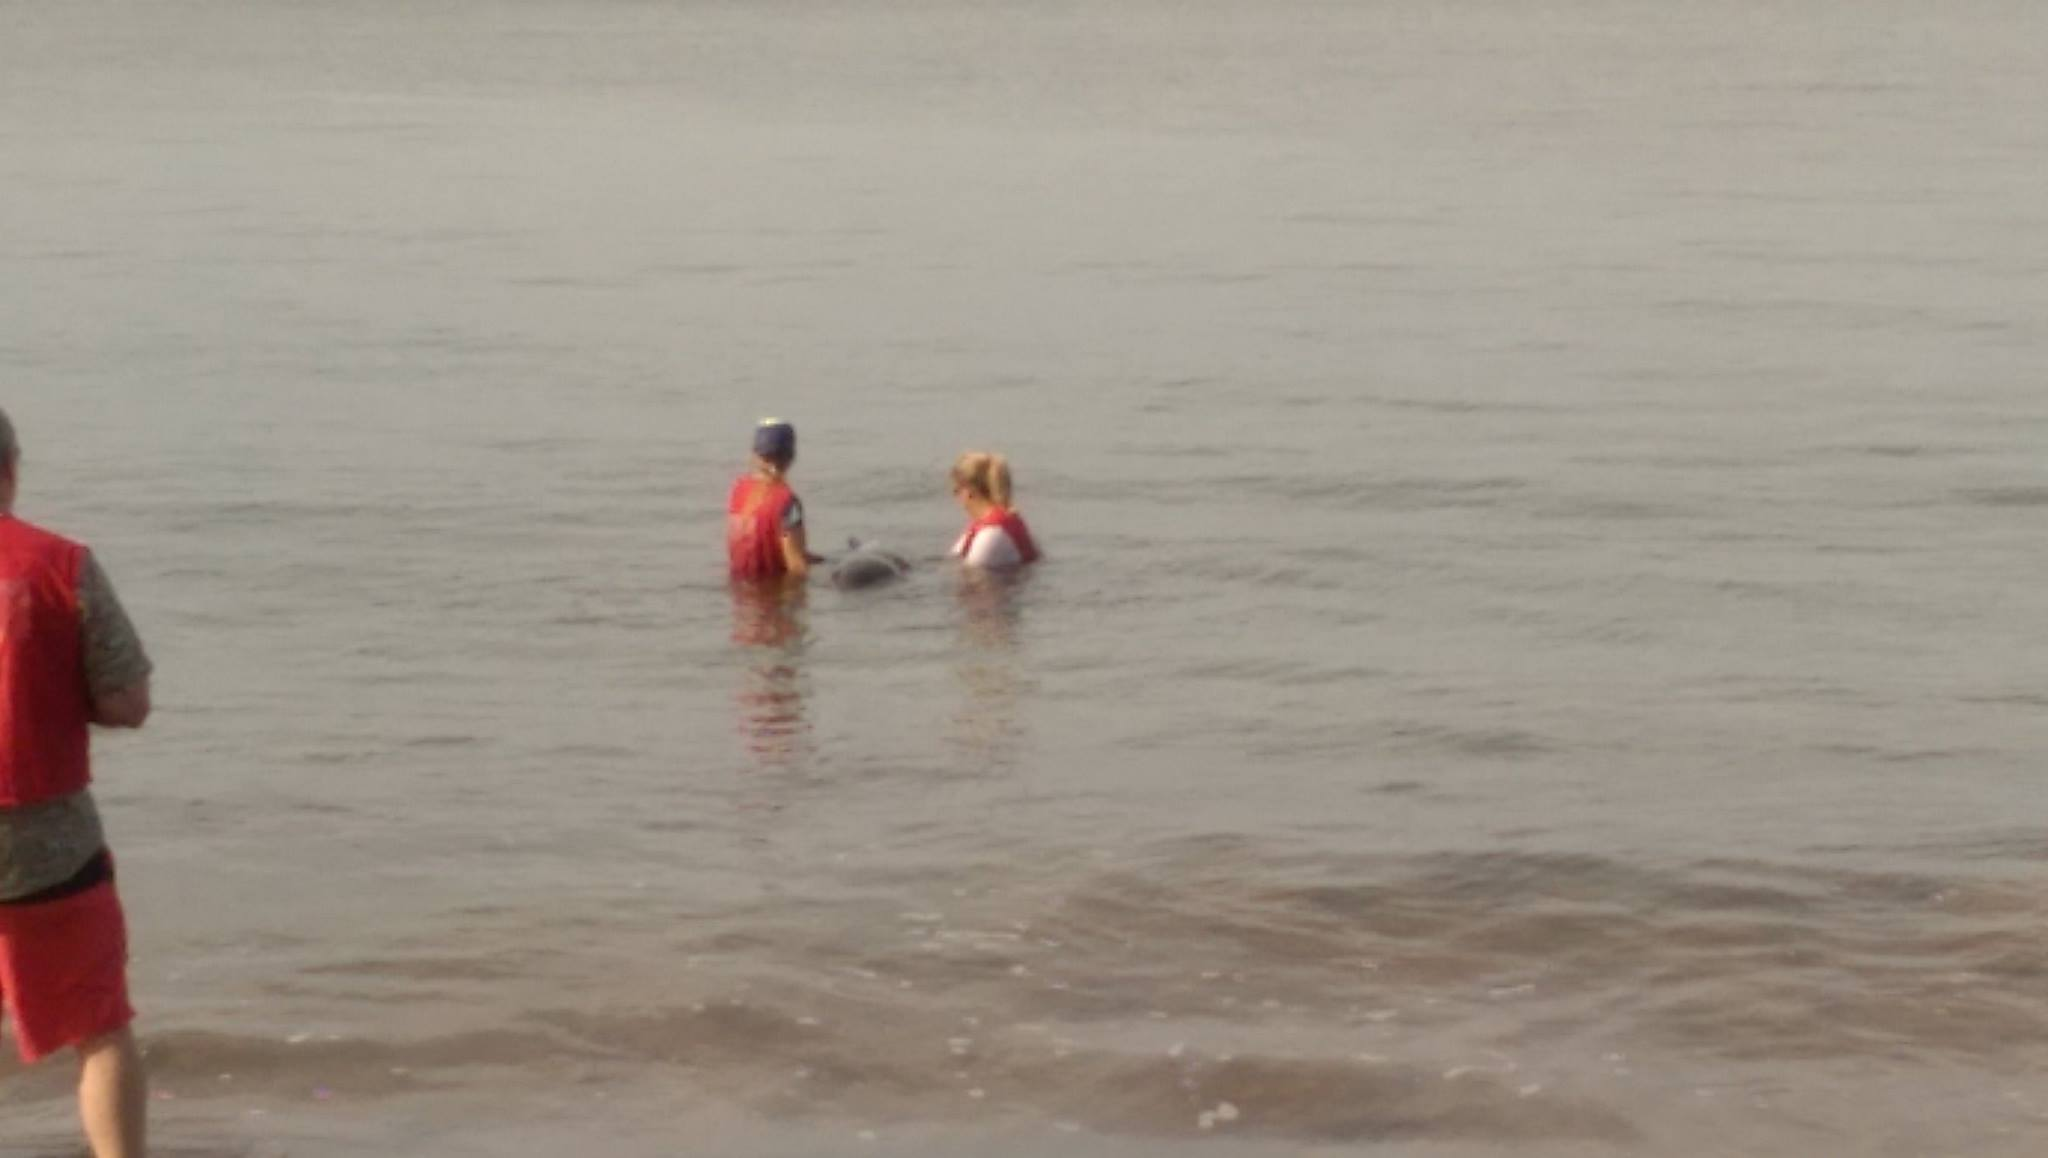 Marine mammal rescue at Sugar Beach in South Maui, 11.22.16. PC: Scot Prince